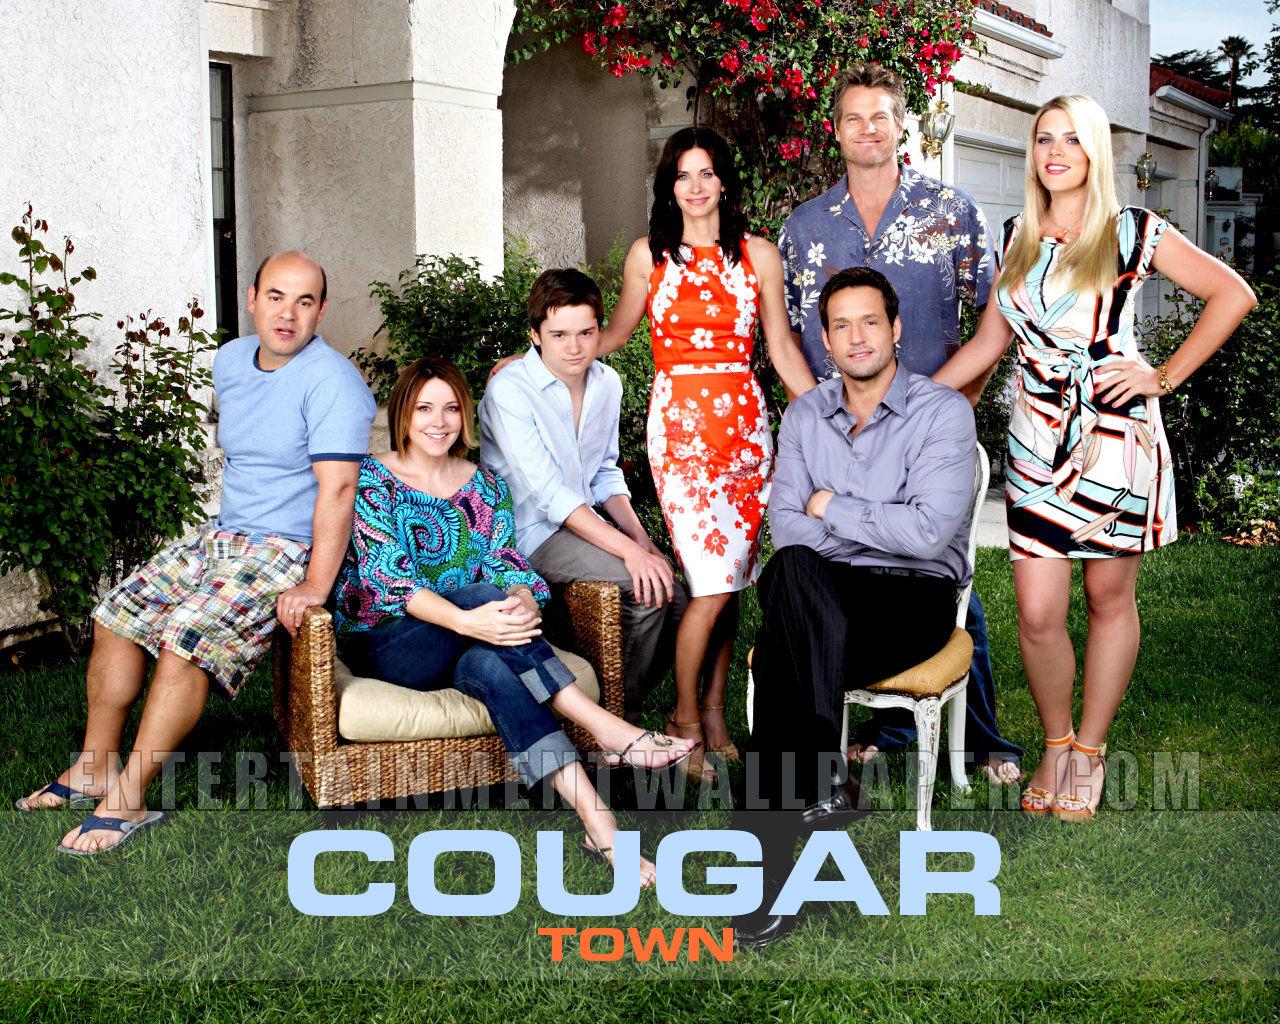 4.bp.blogspot.com__ZOYP1y9e4s8_TTB1FysVE-I_AAAAAAAAC5Y_XQHkem0wGwM_s1600_cougar-town-2